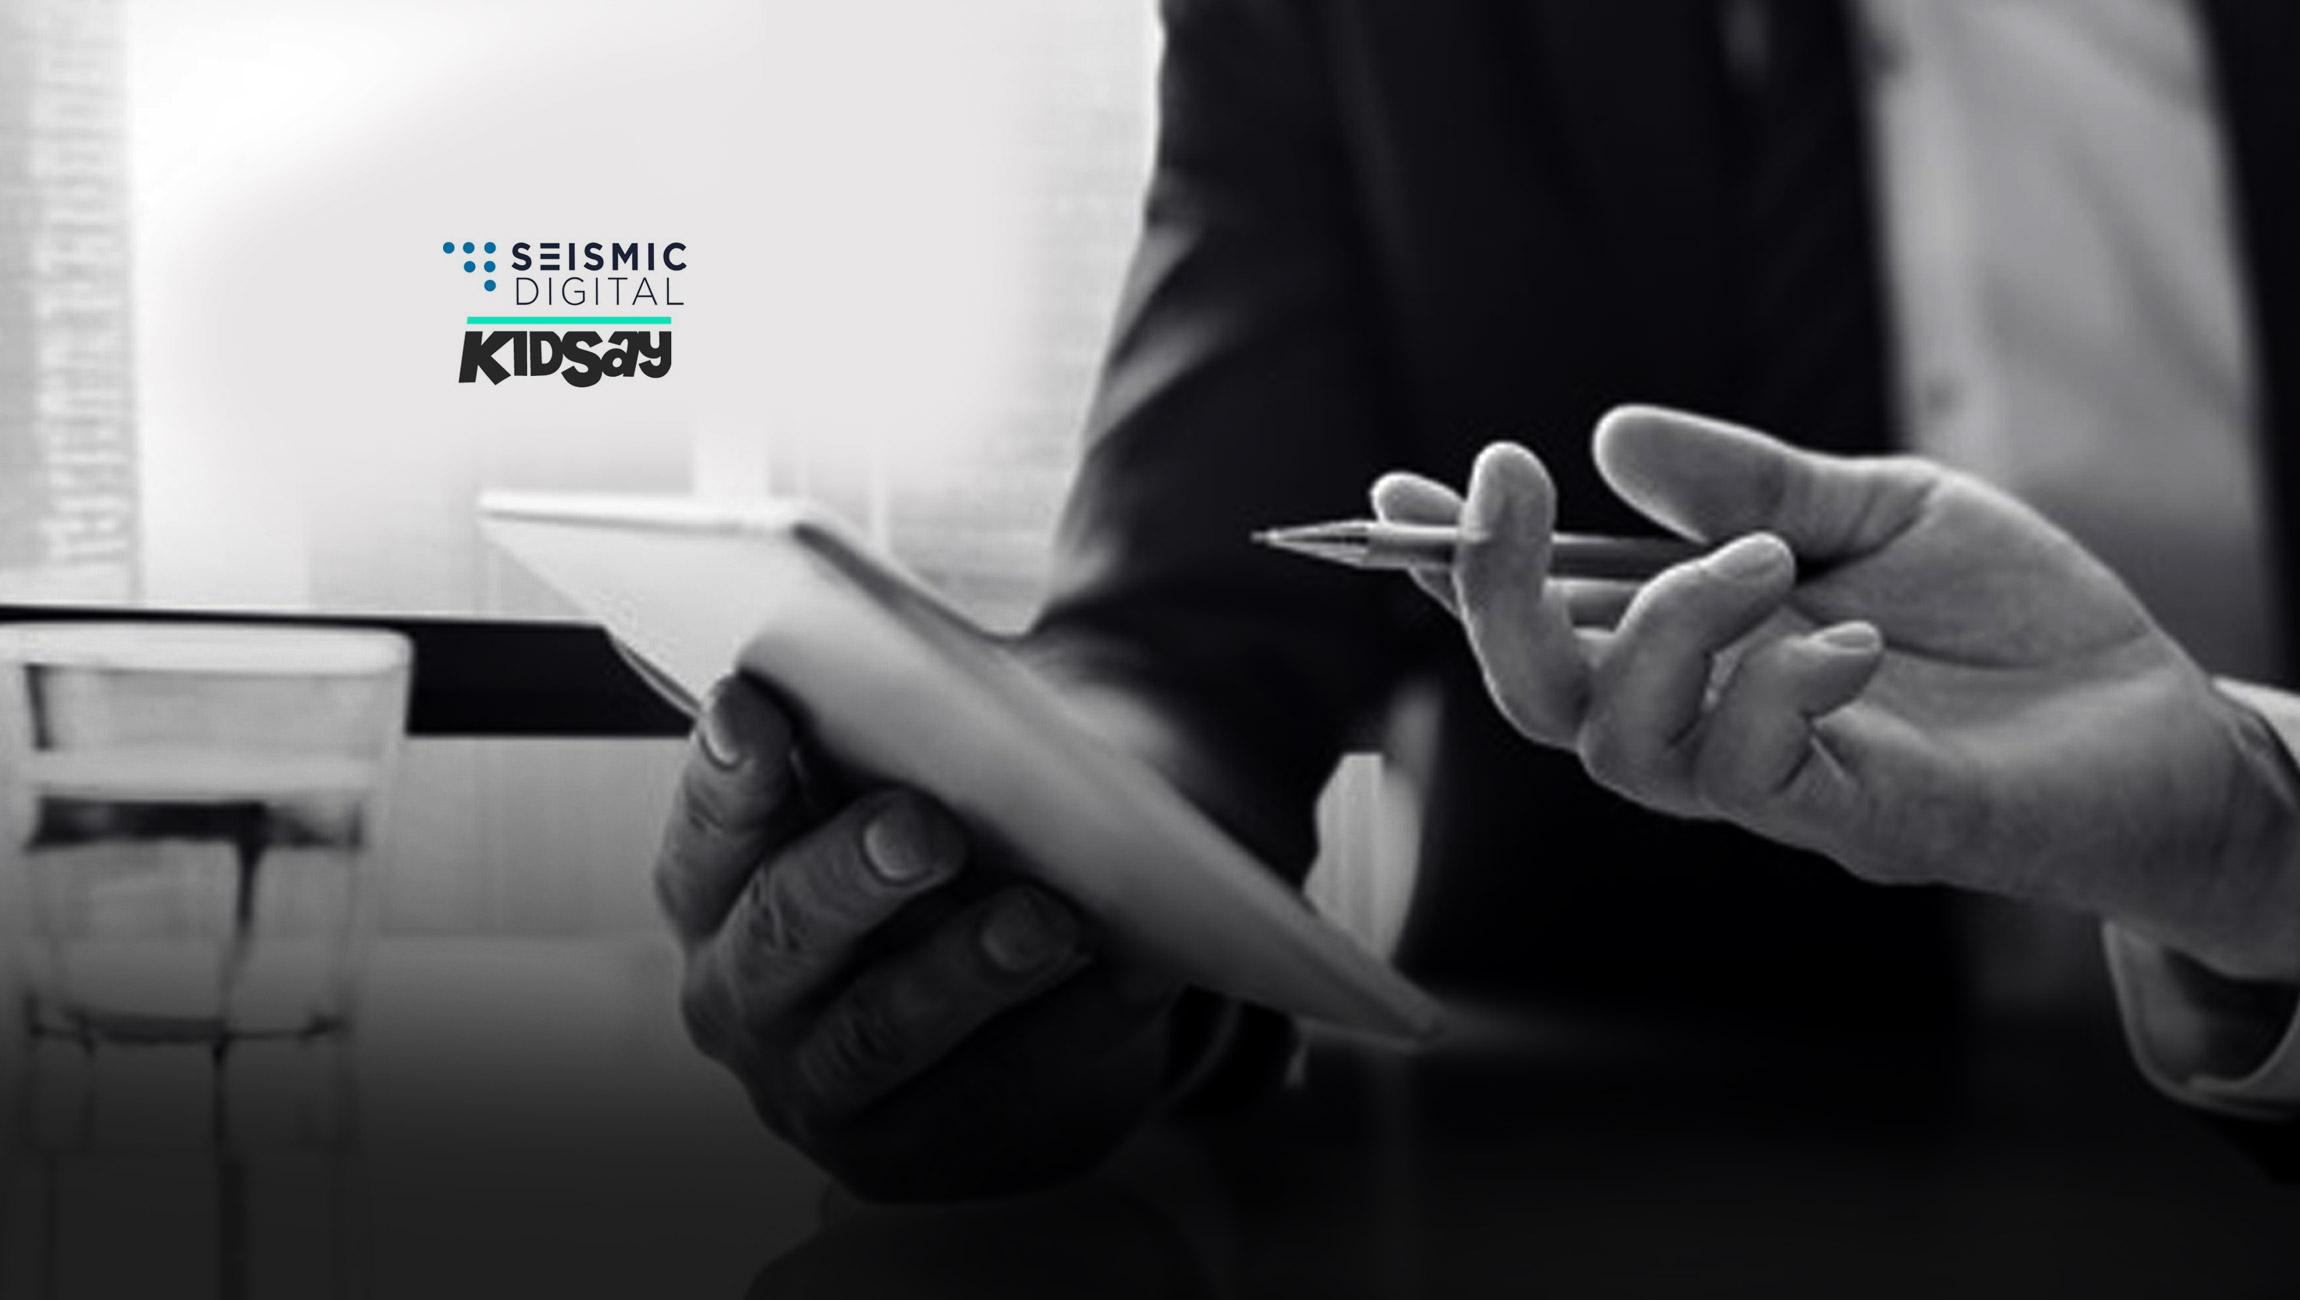 Seismic-Digital-and-KidSay-Form-Strategic-Alliance